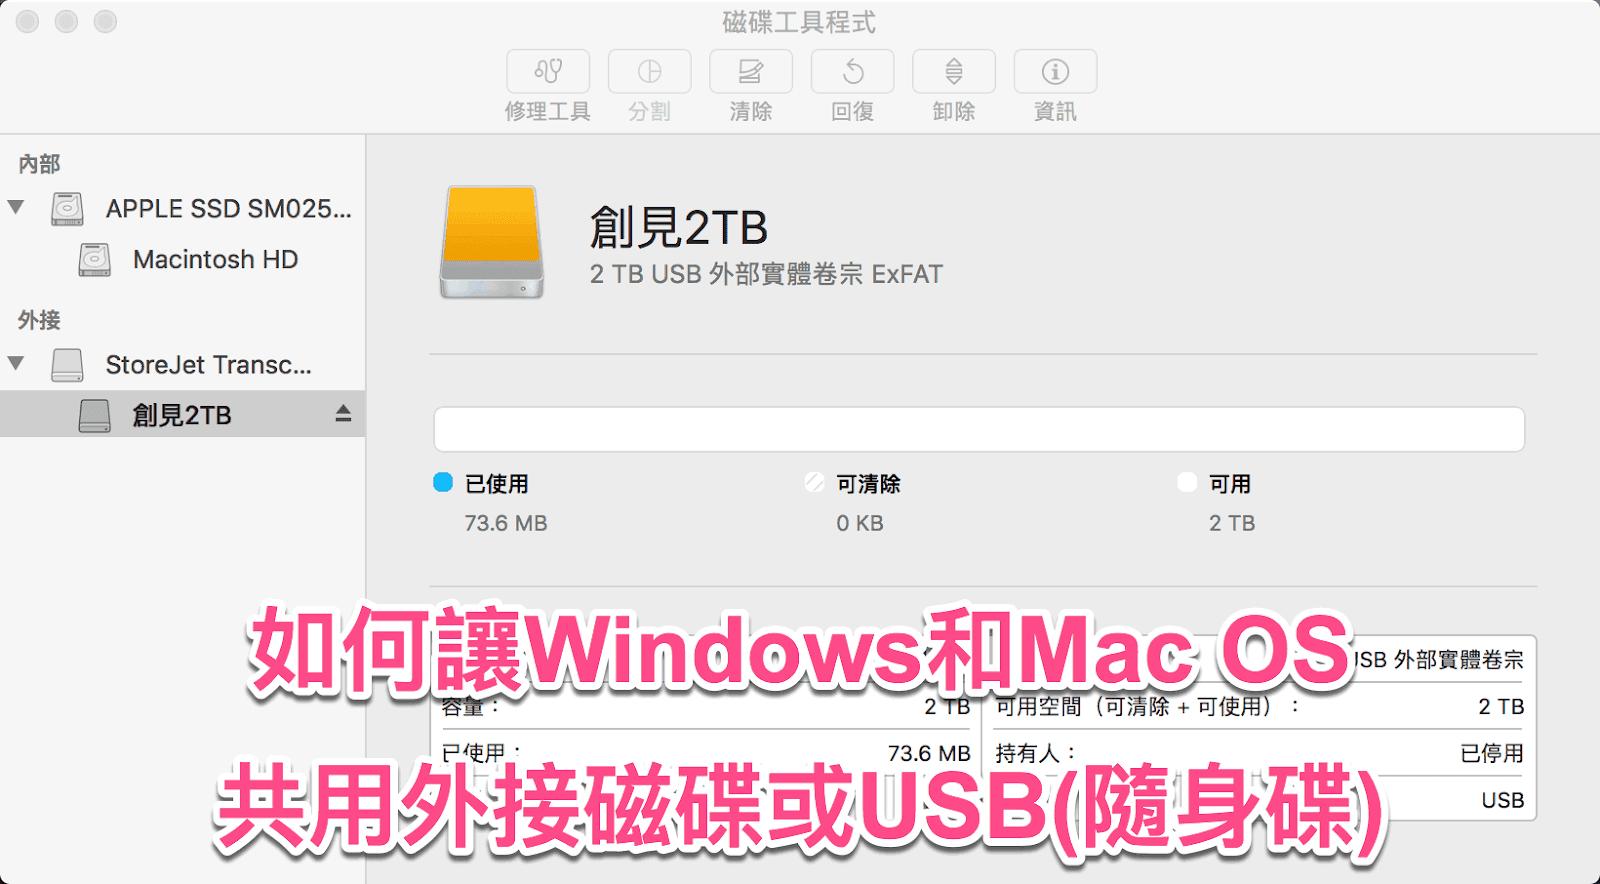 ExFAT格式 - Windows與Mac共用隨身碟